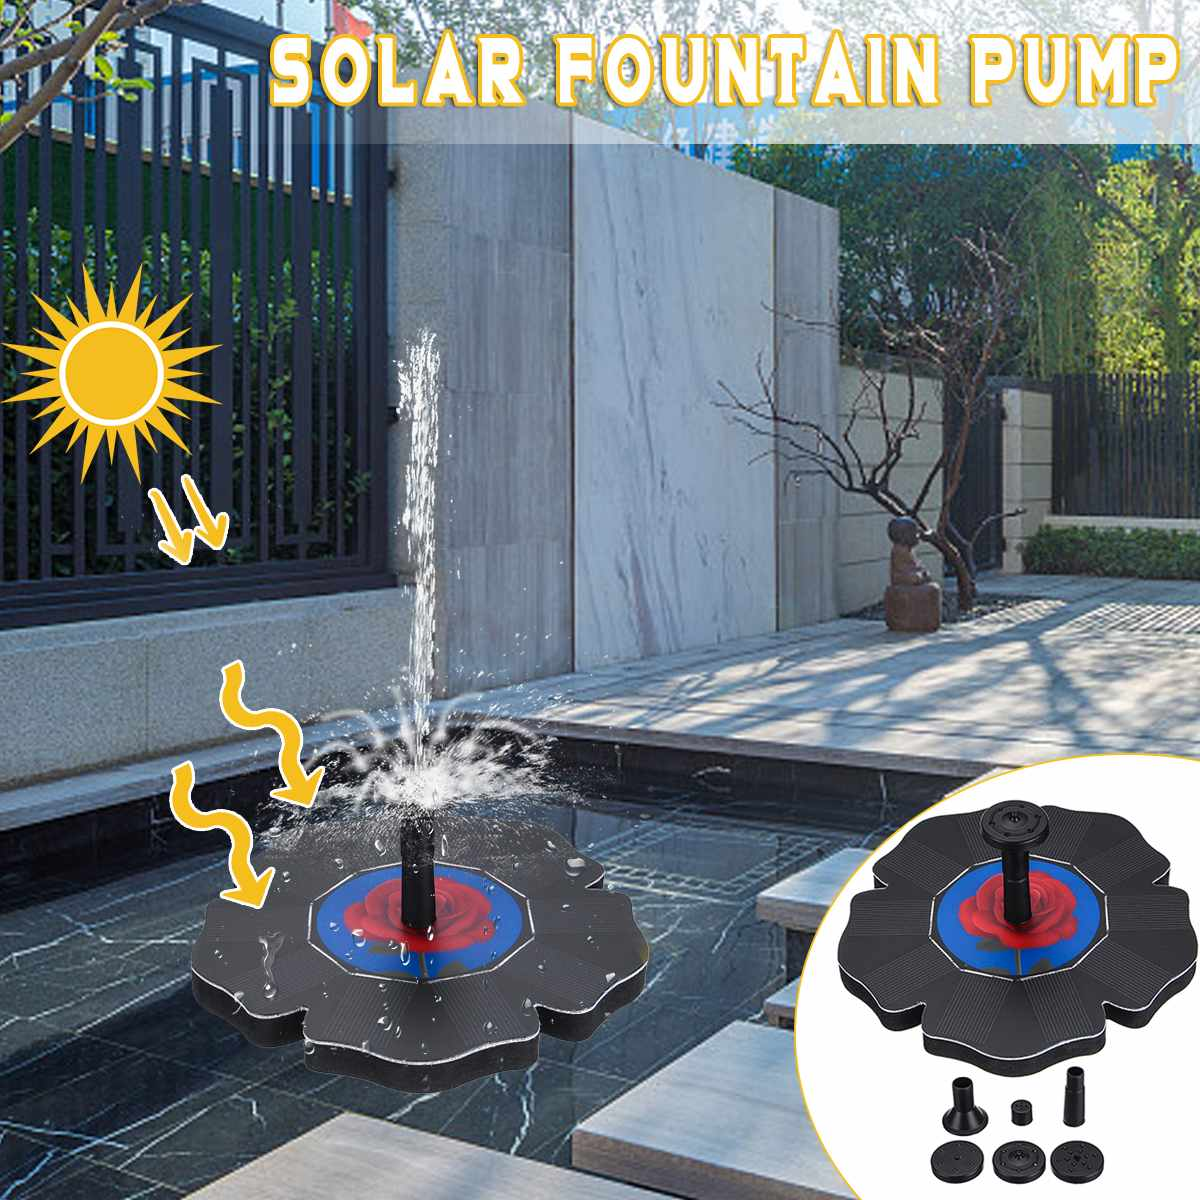 Solar Water Floating Pump Solar Power Water Pump Floating Panel Pool Garden Pond Landscape + 6 Spray Heads Solar Garden Outdoor